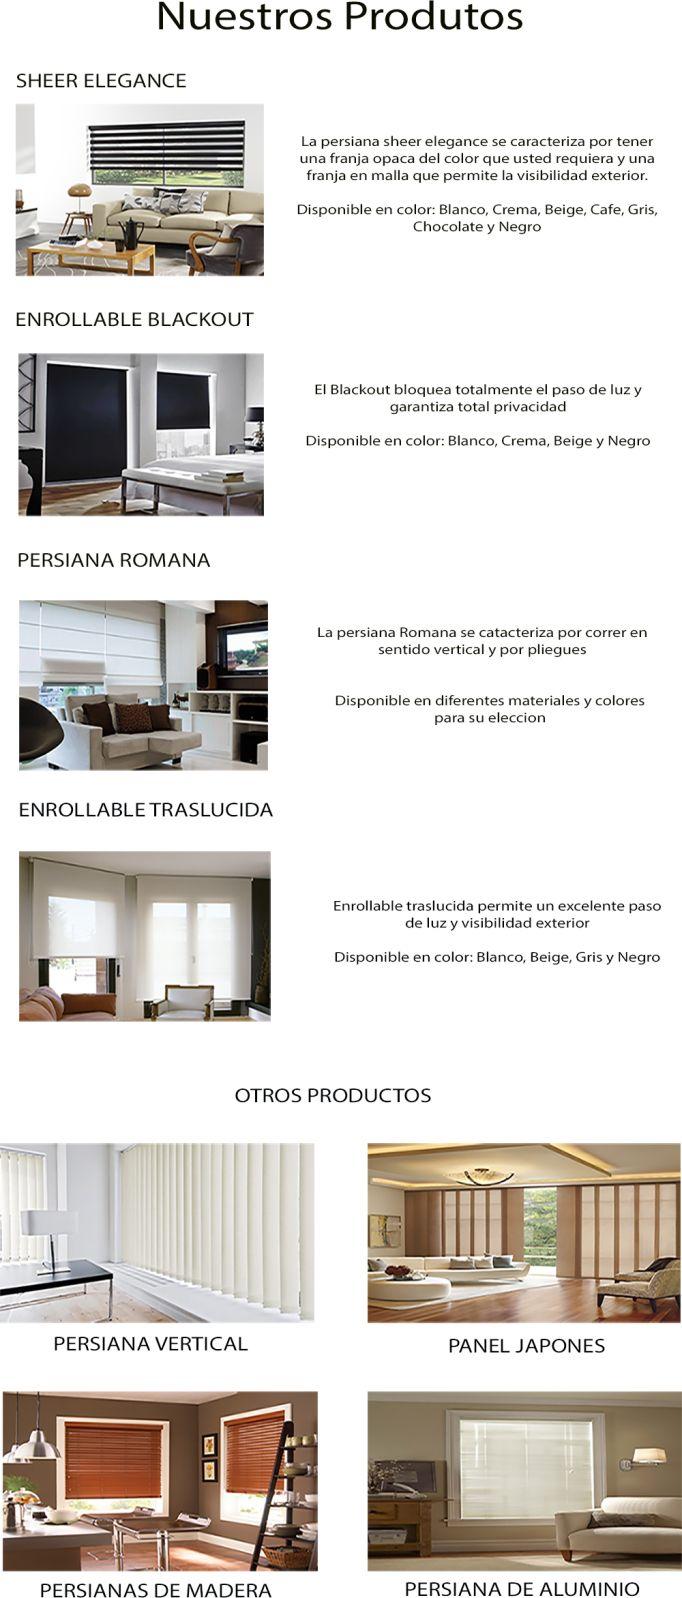 Df5411 esquemas de color casa exteriores con persianas negras - Cortinas Modernas Persianas Blackout Sheer Elegance Romanas 35 000 En Mercado Libre